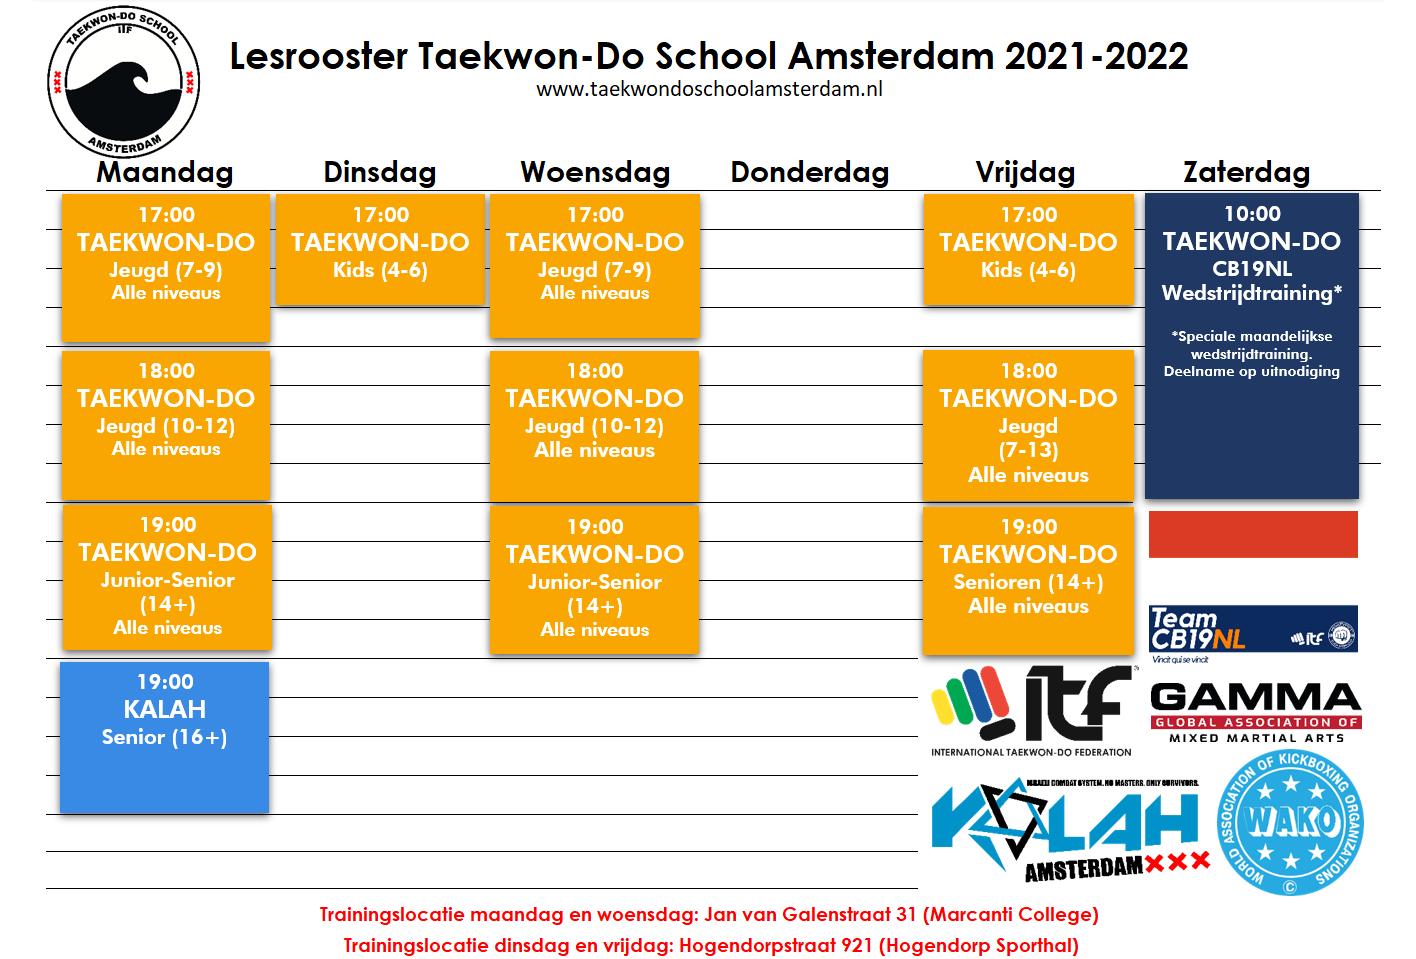 Lesrooster Taekwon-Do School Amsterdam 2021-2022